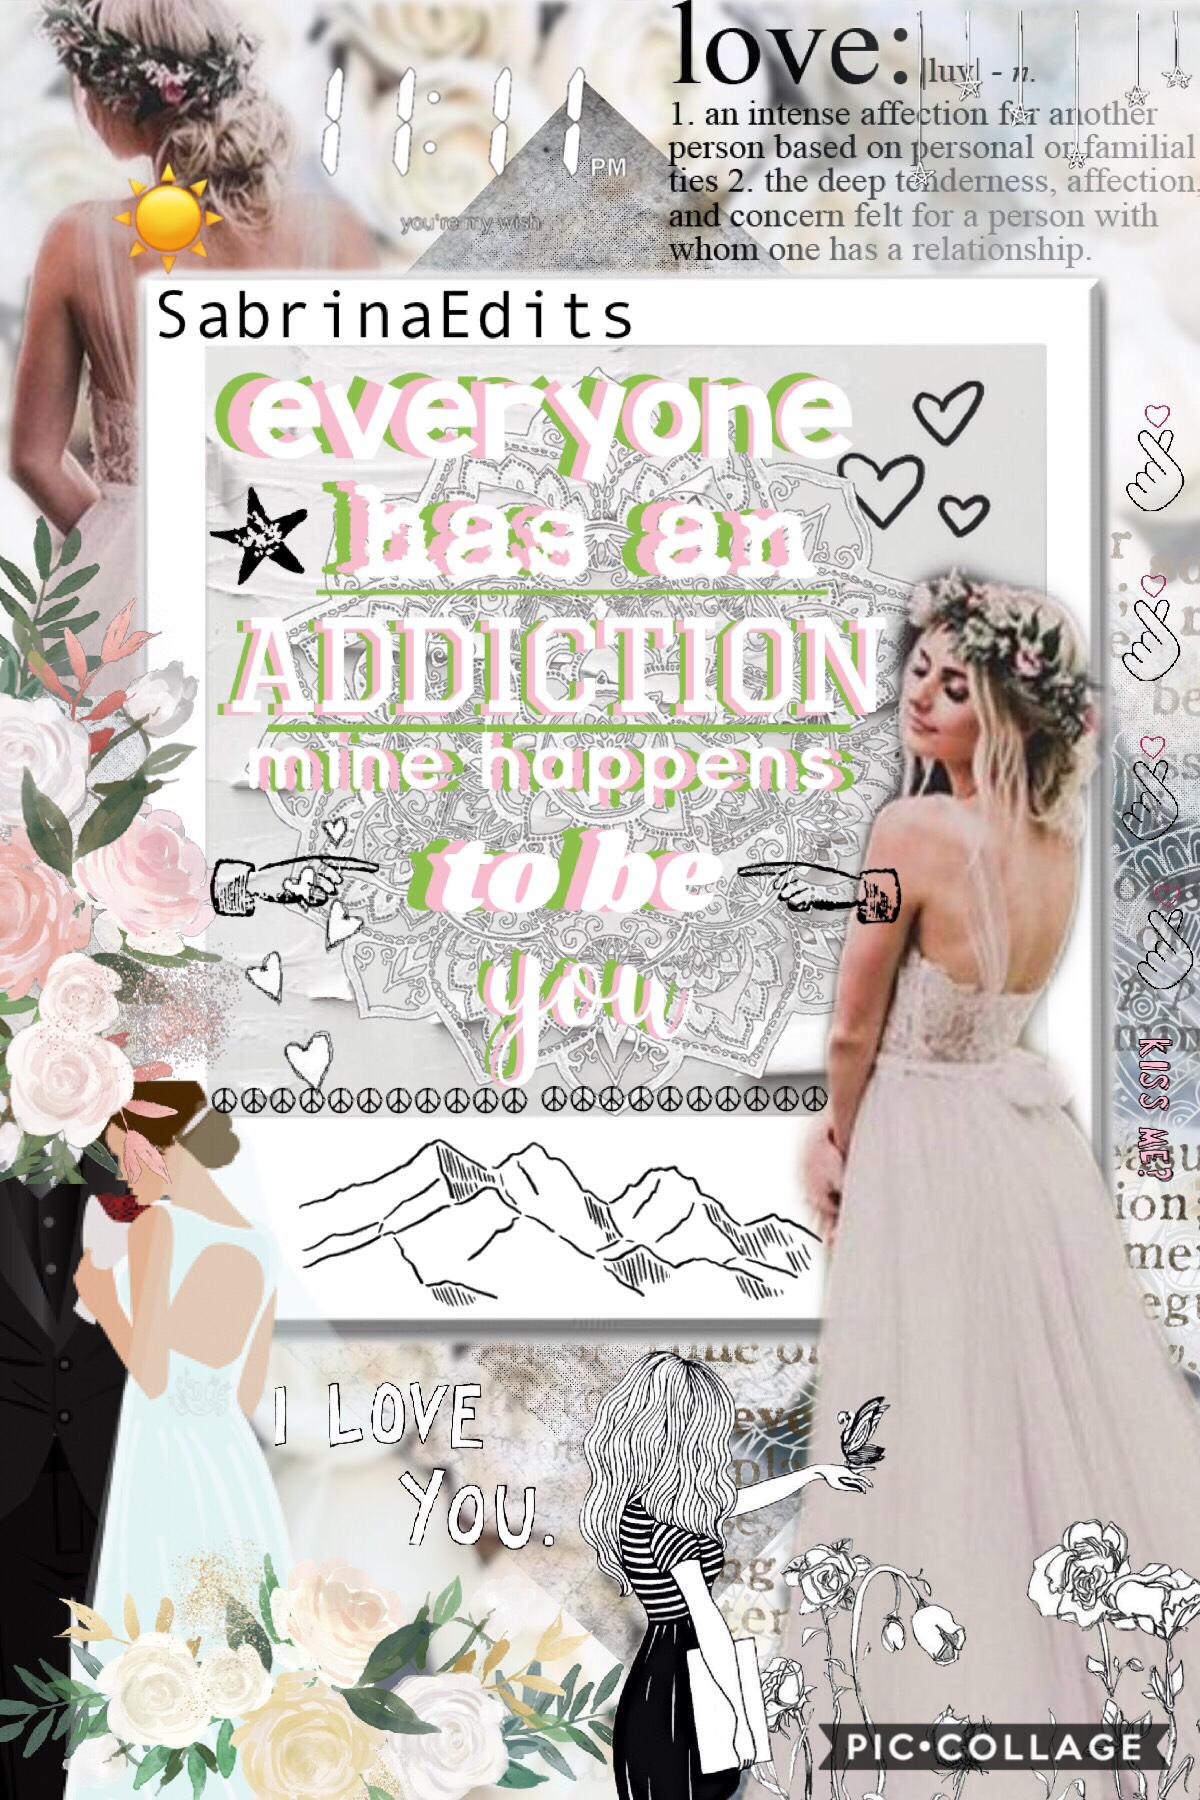 👰TaP👰 rate 1/10. qotd: beach wedding or wedding at a church? aotd: wedding 💒 on the beach 🏖